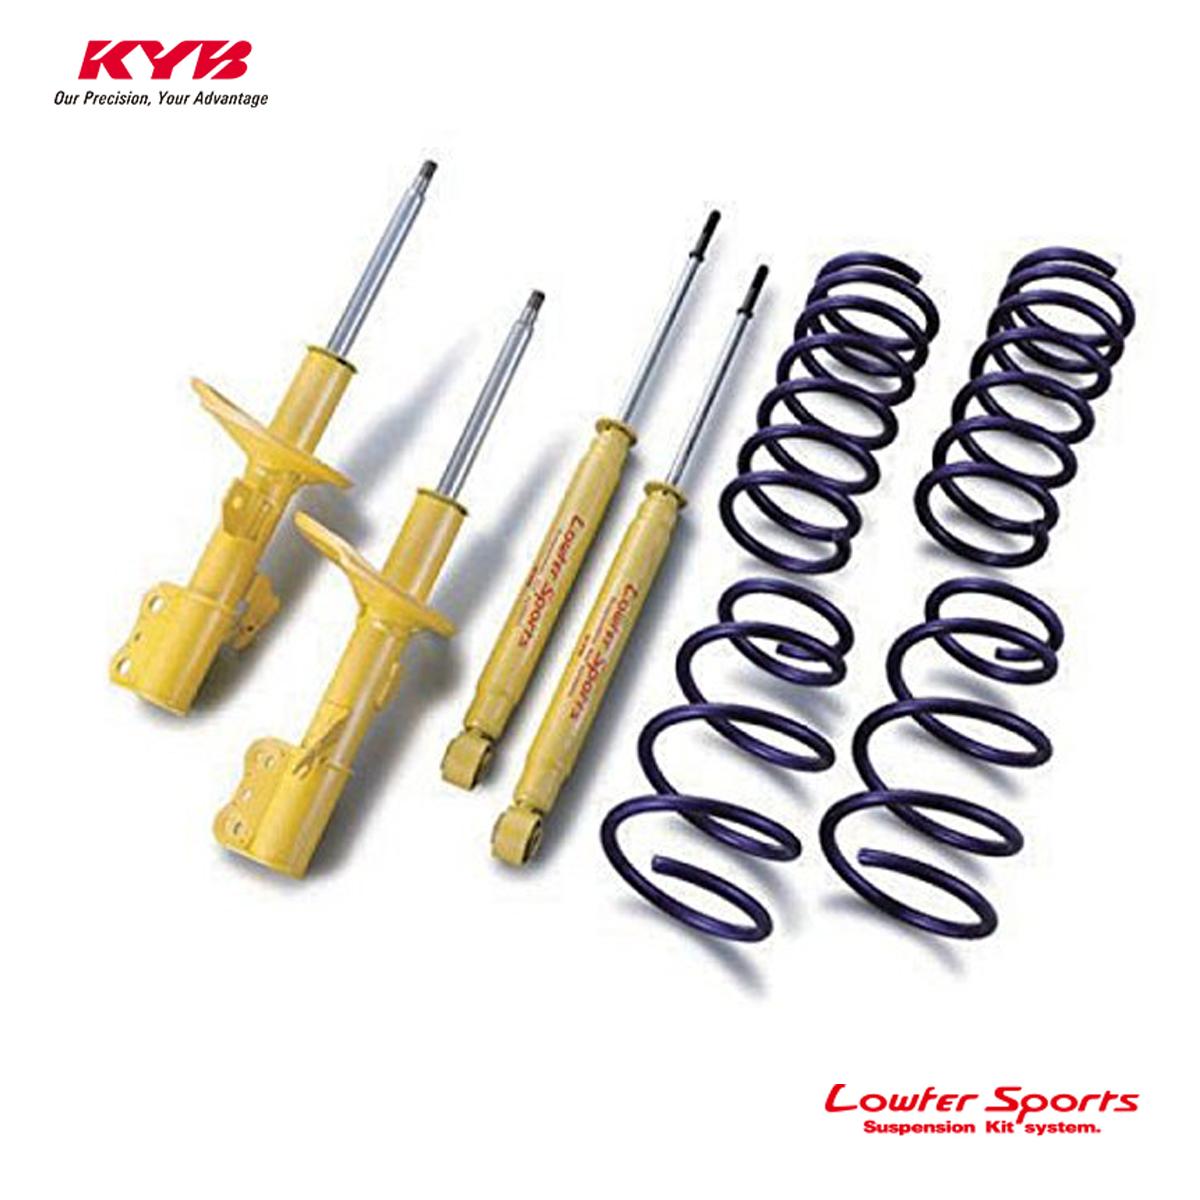 KYB カヤバ エルグランド ATWE50 ショックアブソーバー サスペンションキット Lowfer Sports LKIT-E5016 配送先条件有り